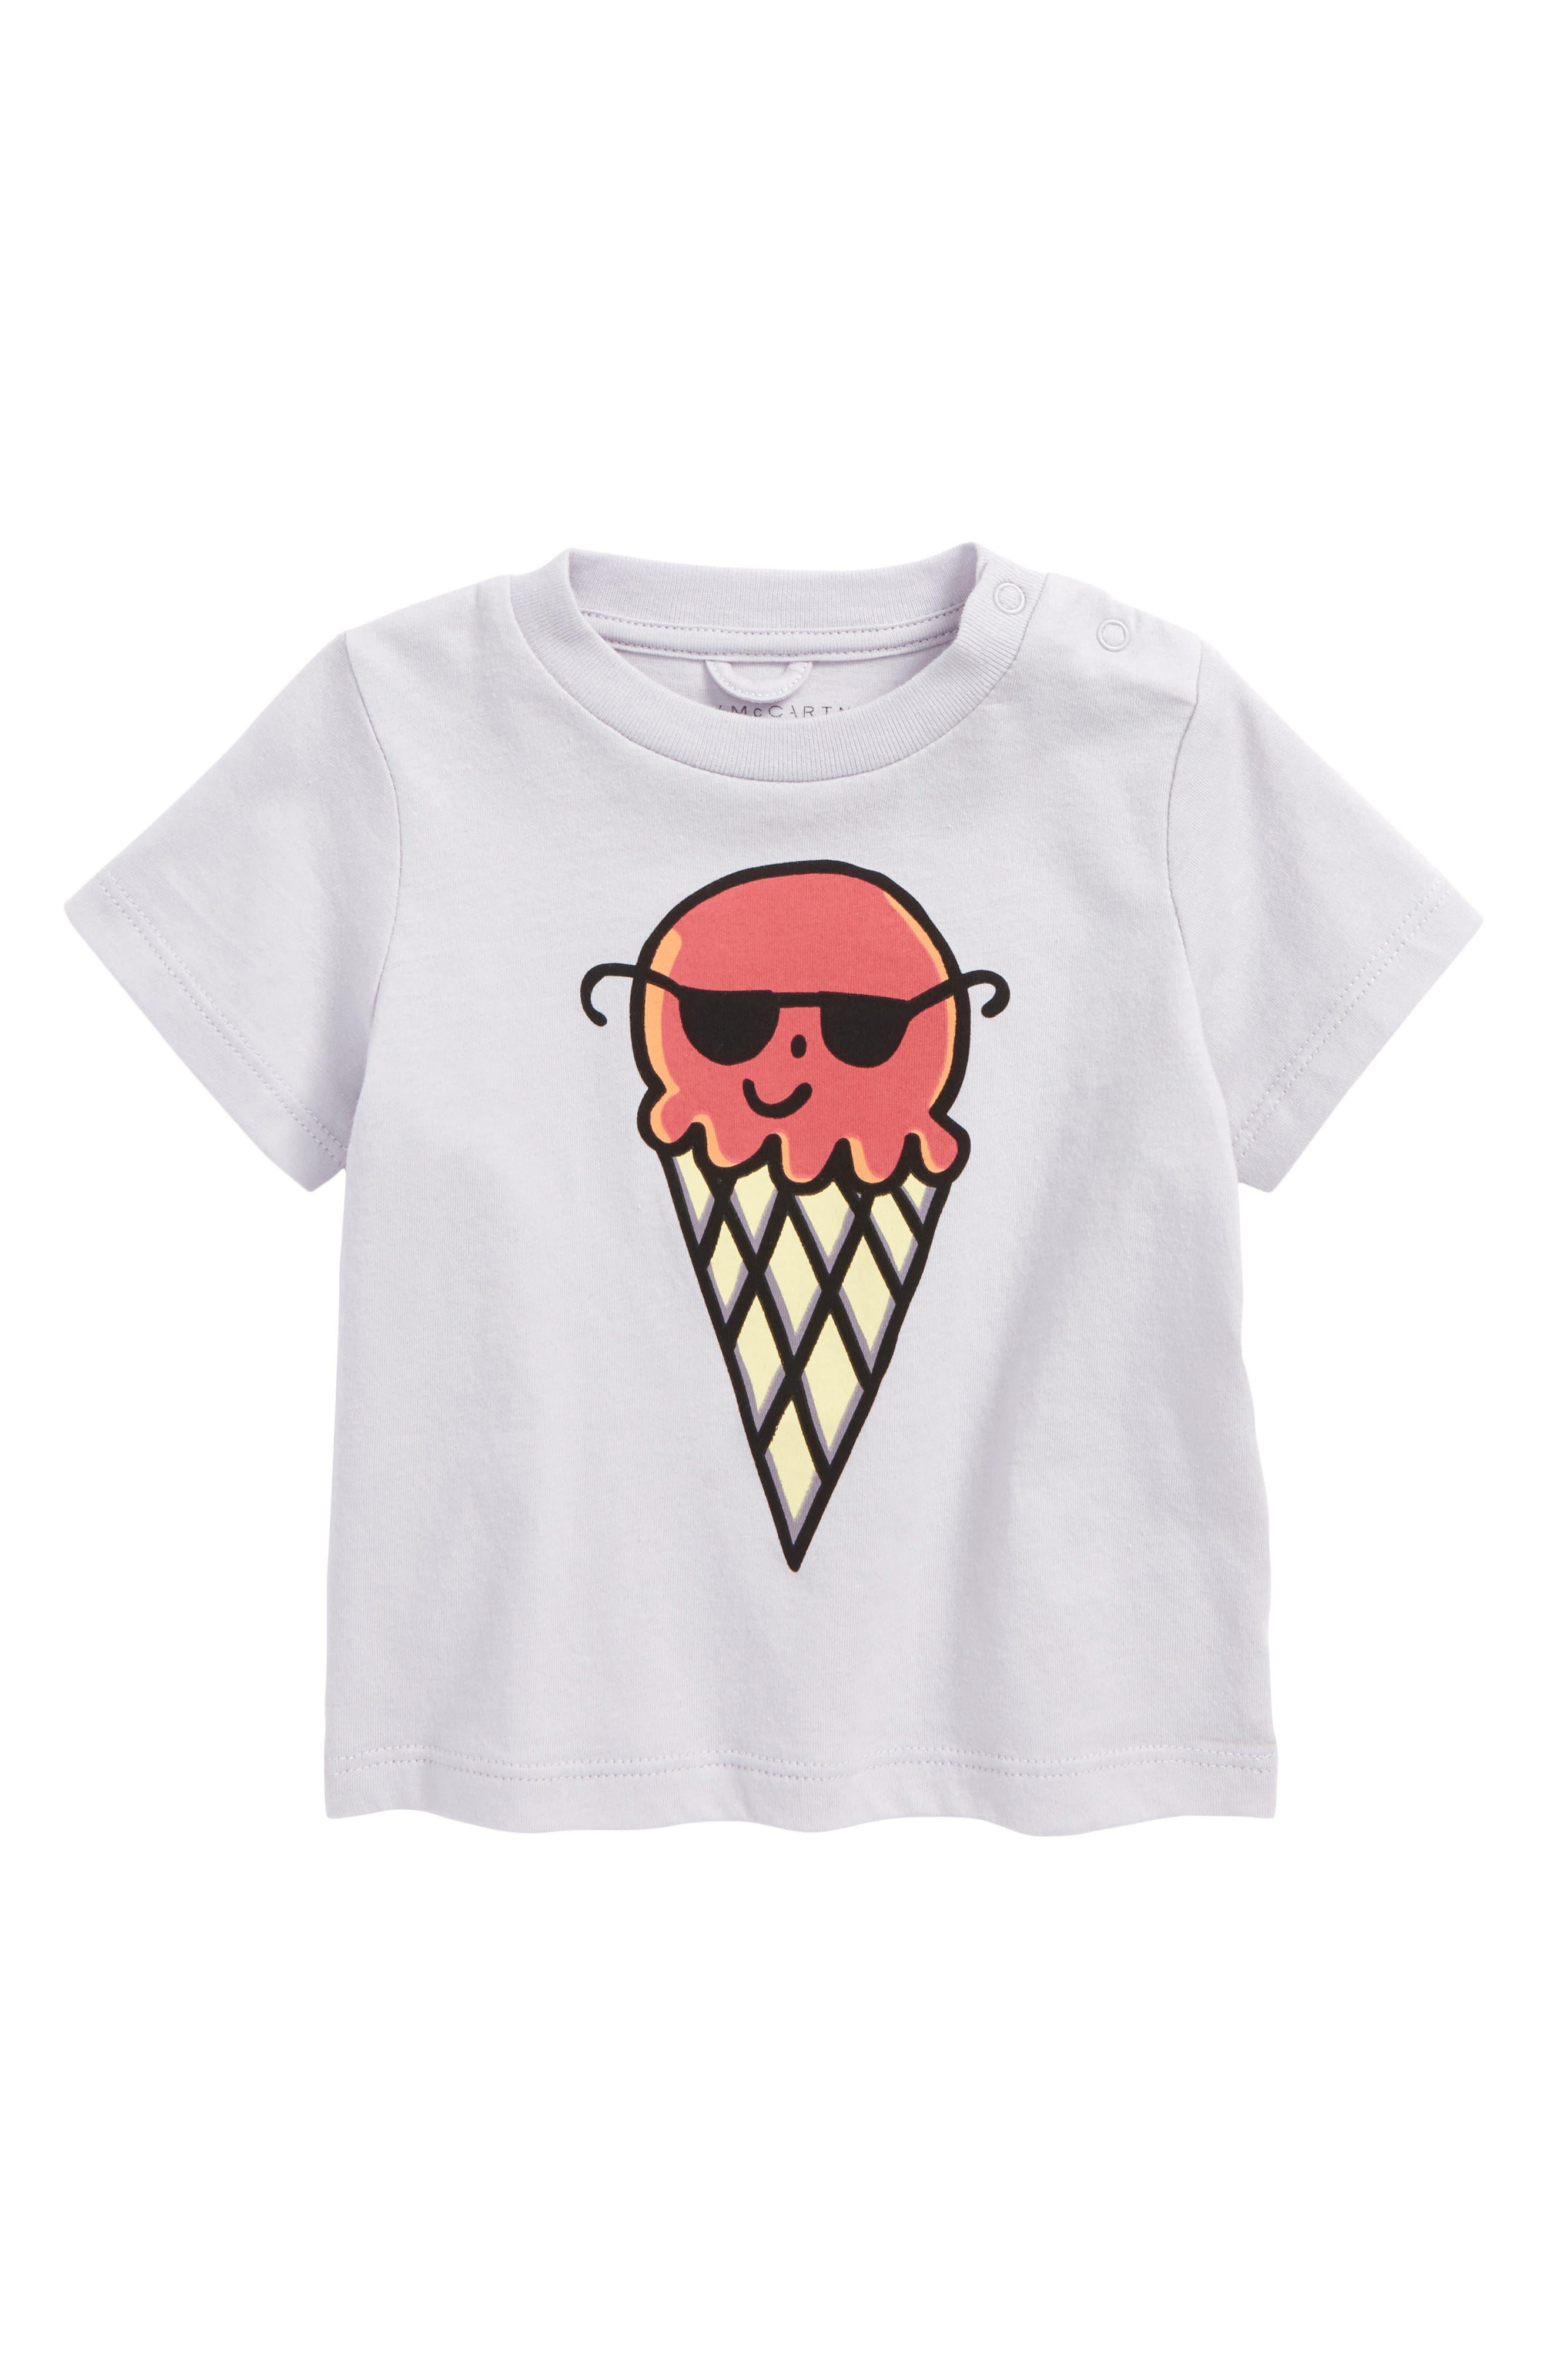 Chuckle Ice Cream Cone Tee,                             Main thumbnail 1, color,                             Lavender